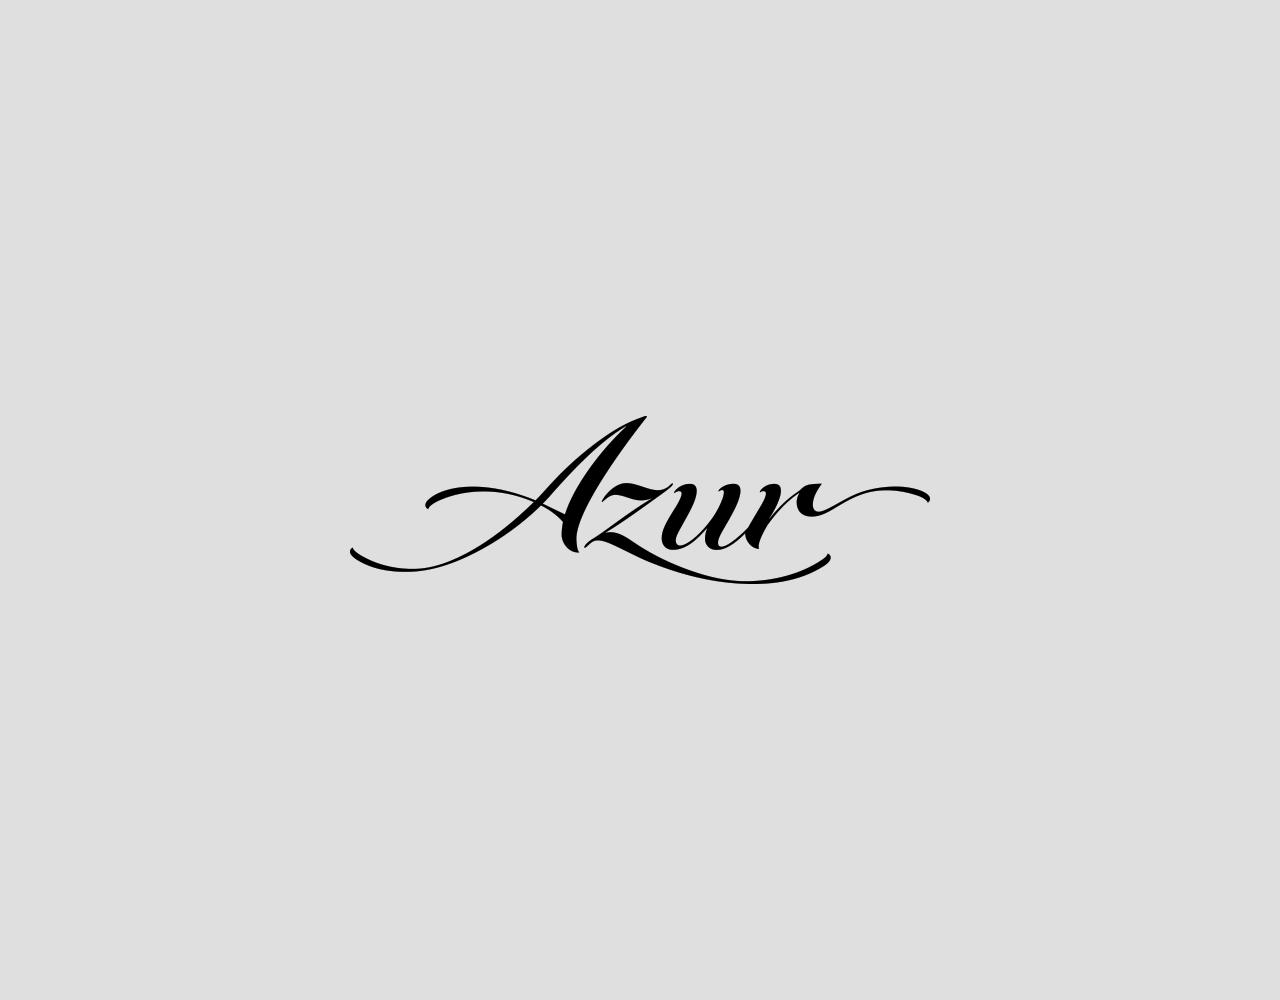 Kevin-Kwok-Design-Logofolio-14